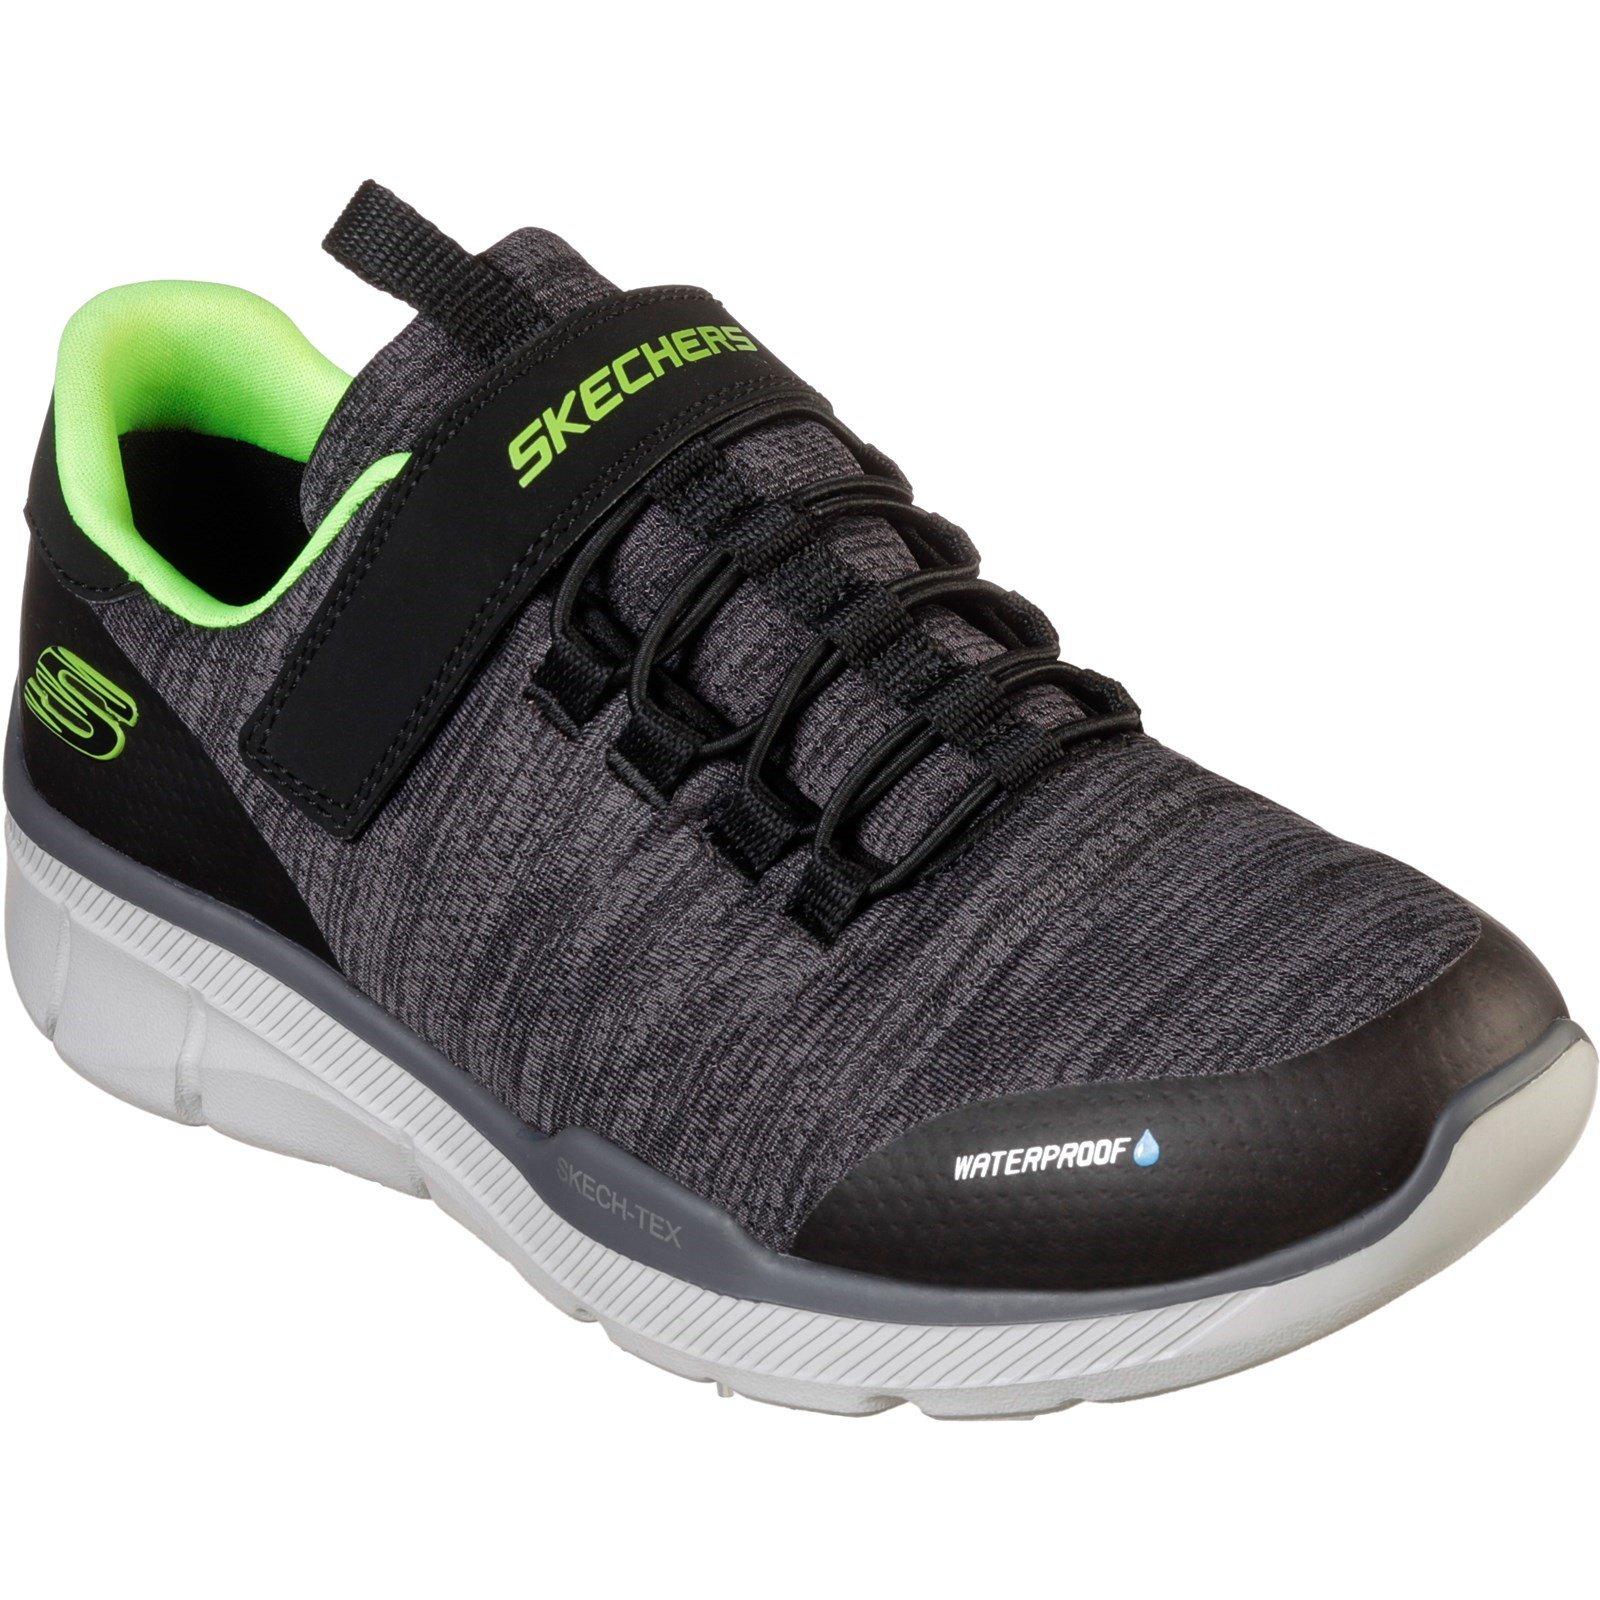 Skechers Unisex Equalizer 3.0 Aquablast Trainer Black 28533 - Black/Charcoal 2